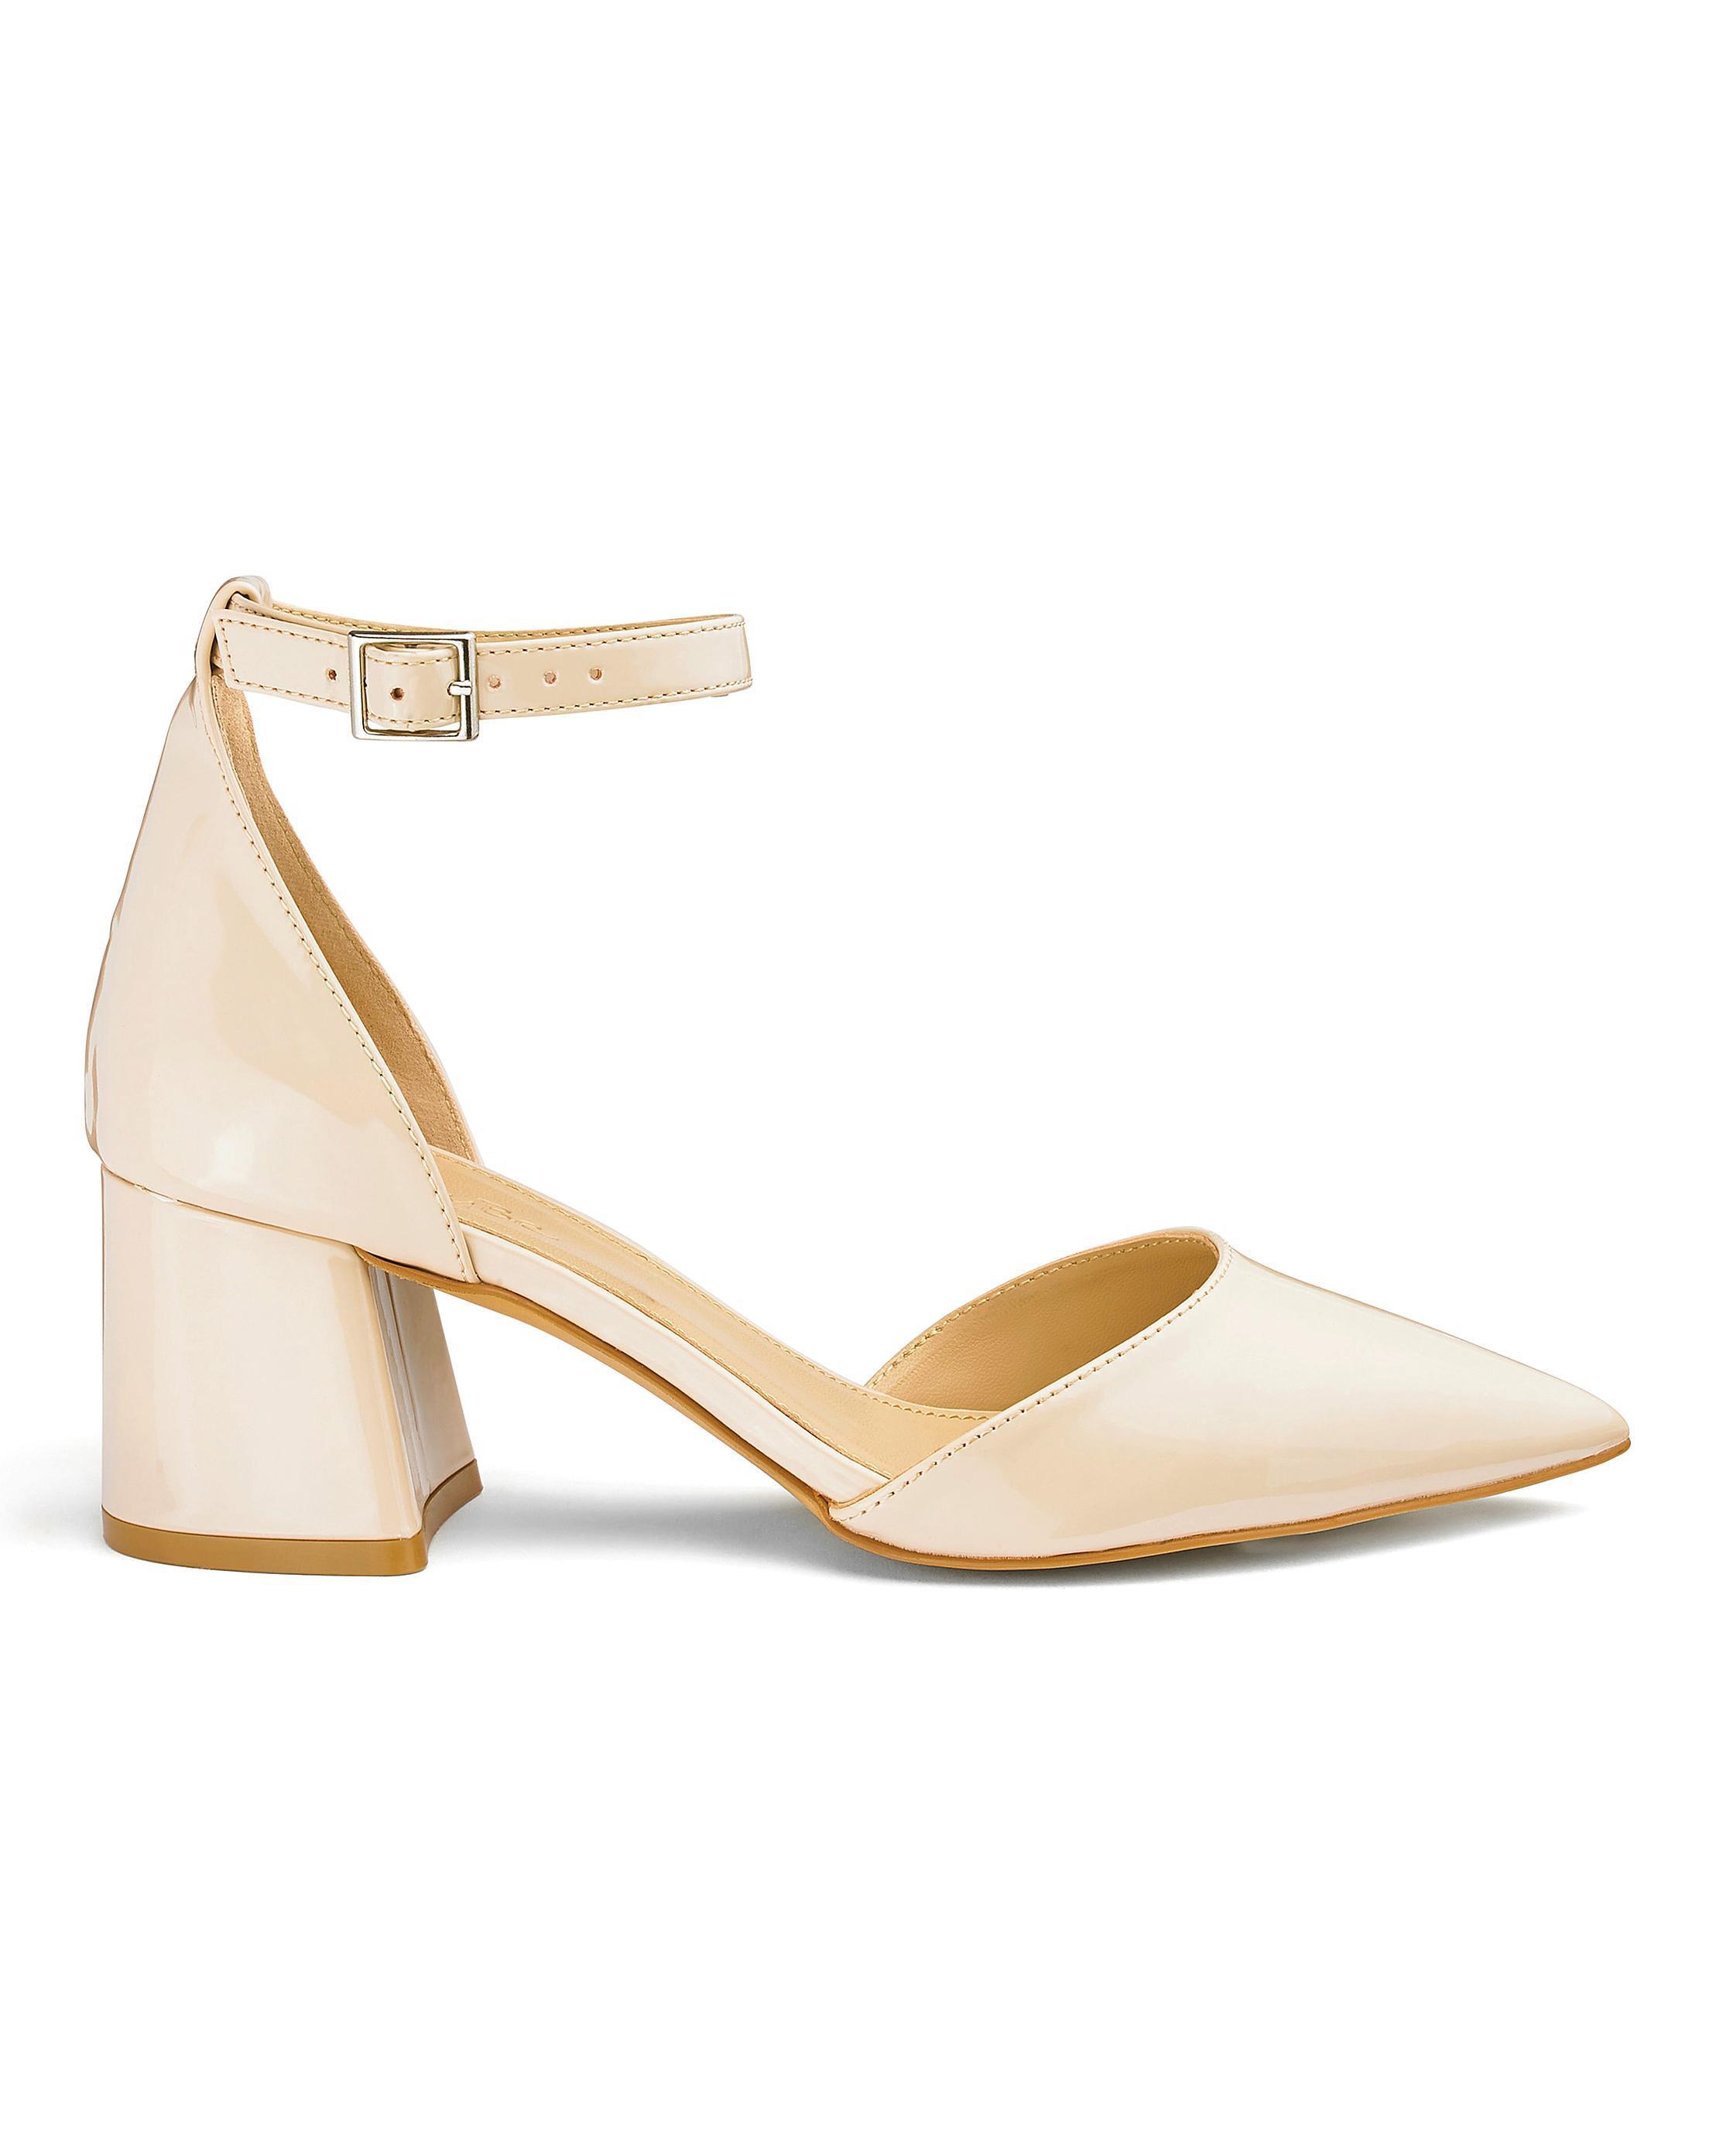 b36c492900d Lyst - Simply Be Este Pointed Block Heels in Natural